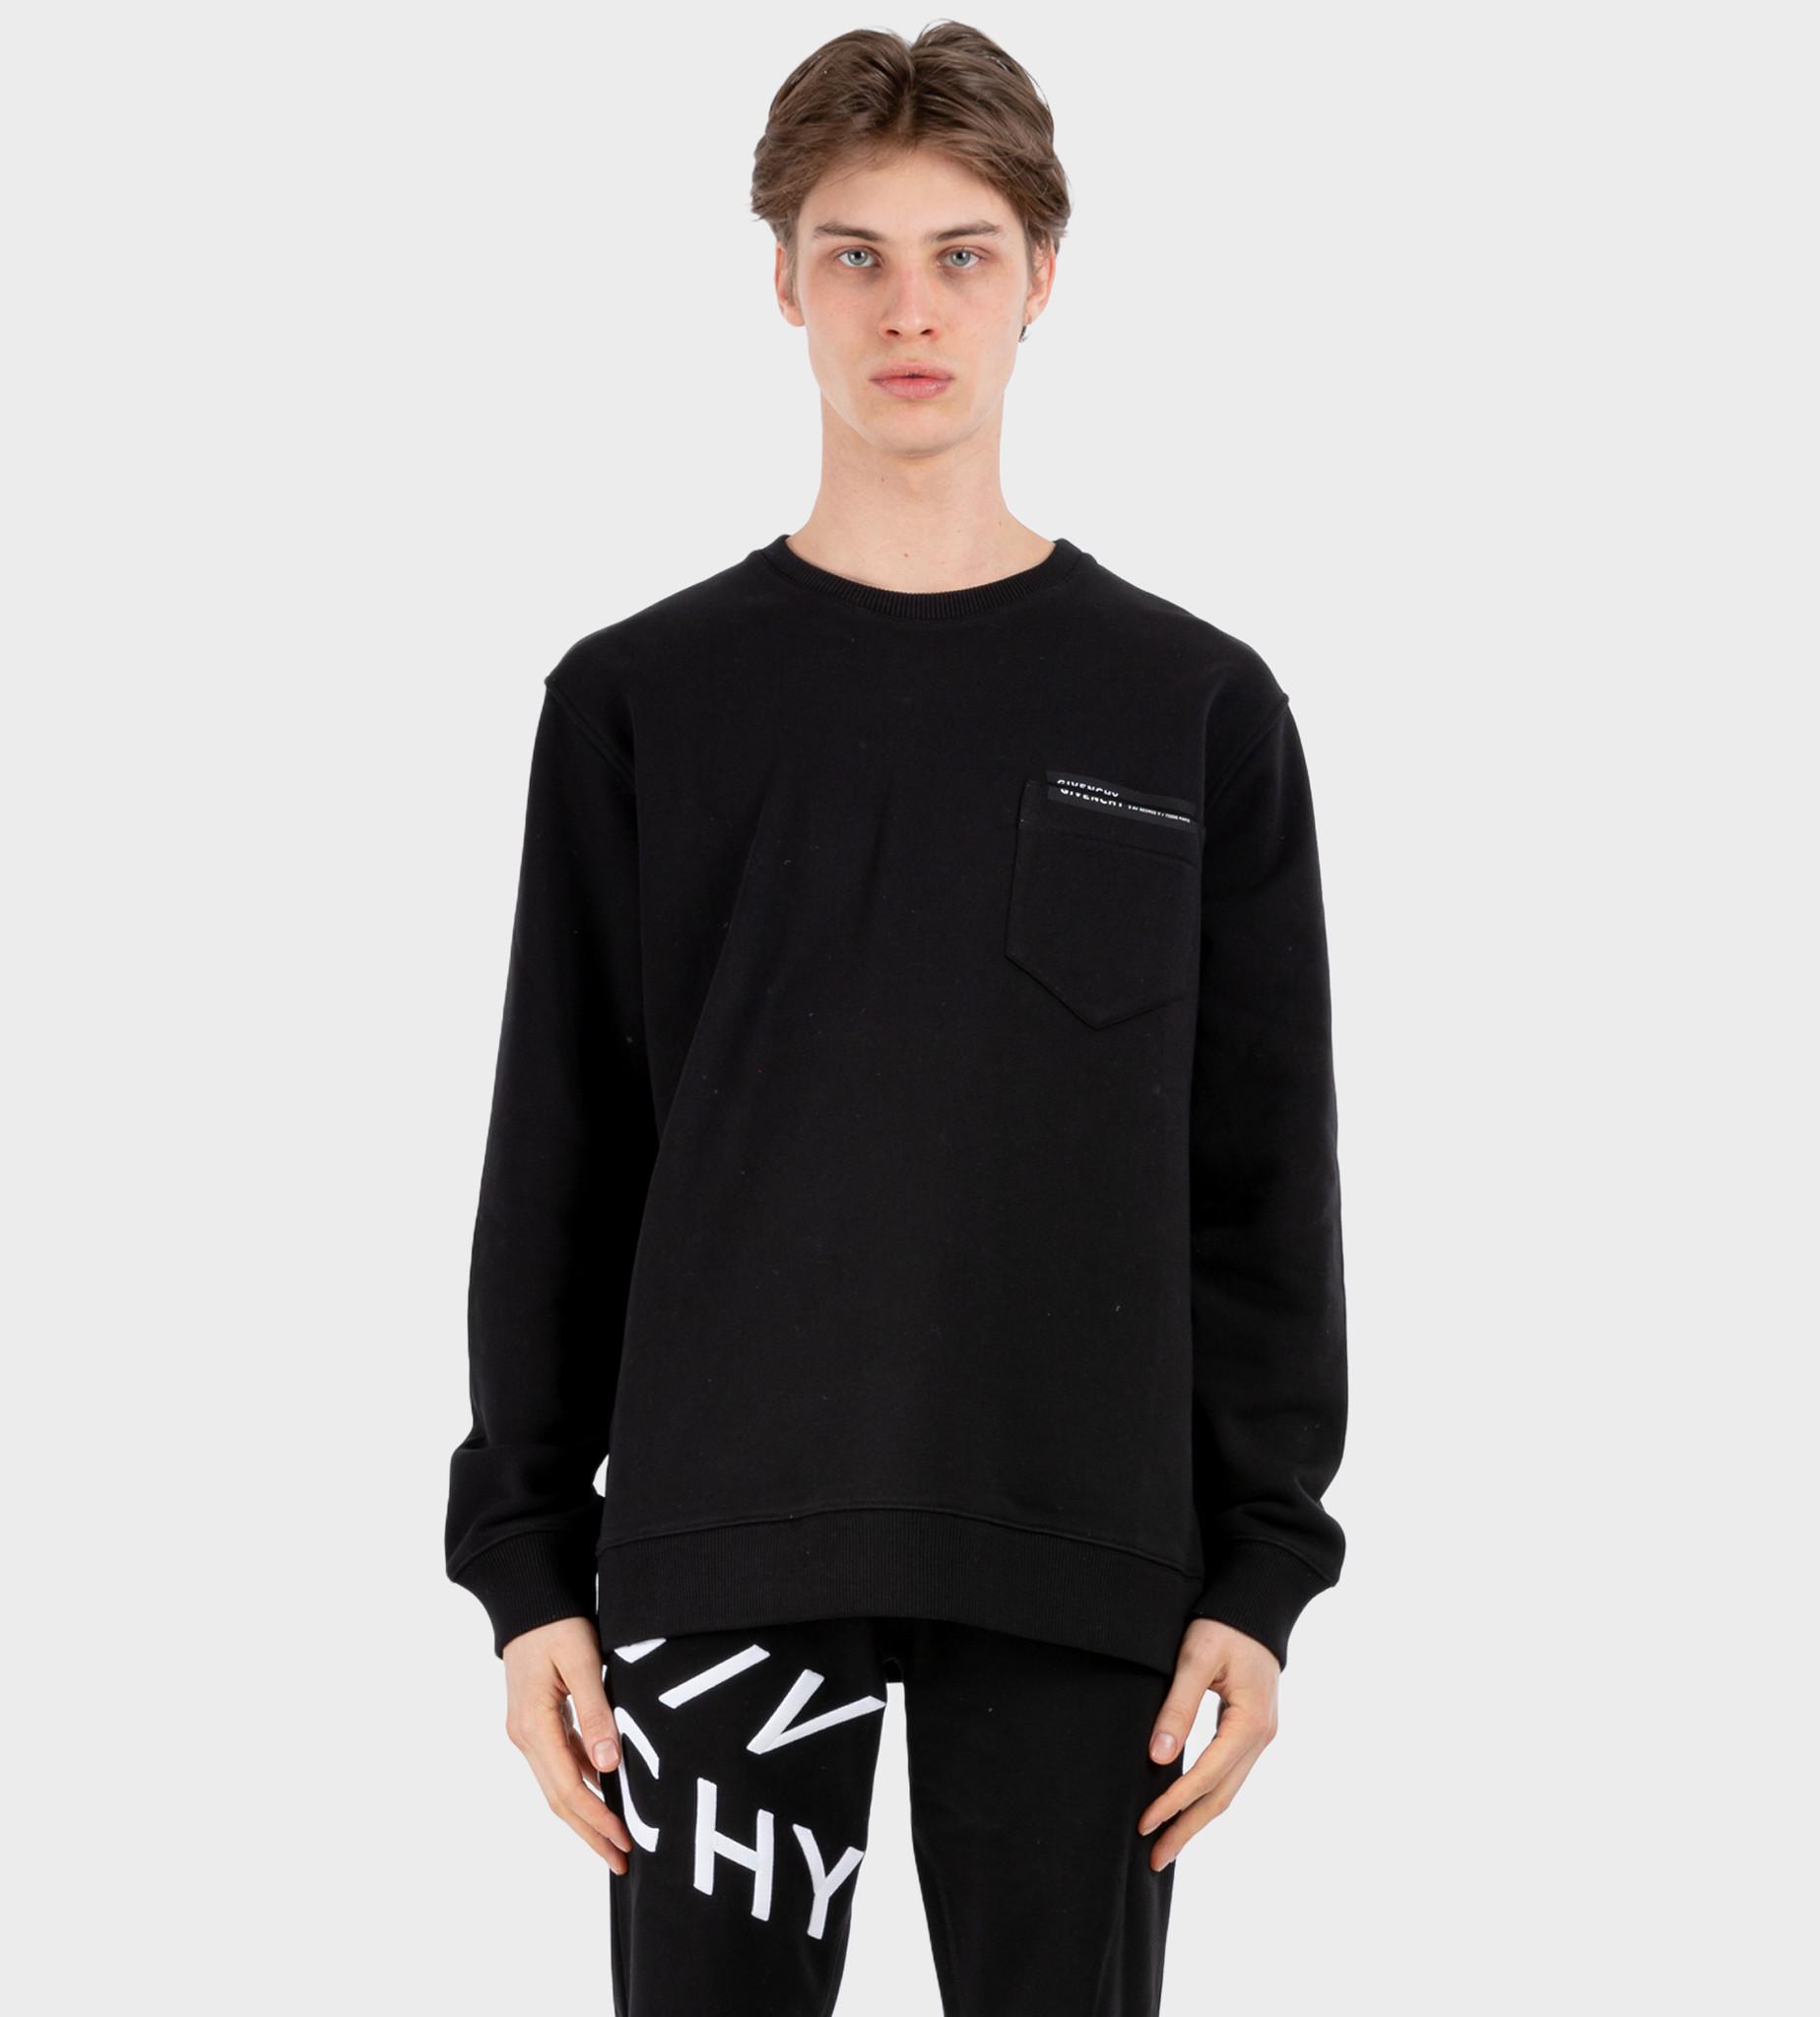 GIVENCHY Logo Patch Pocket Sweatshirt Black